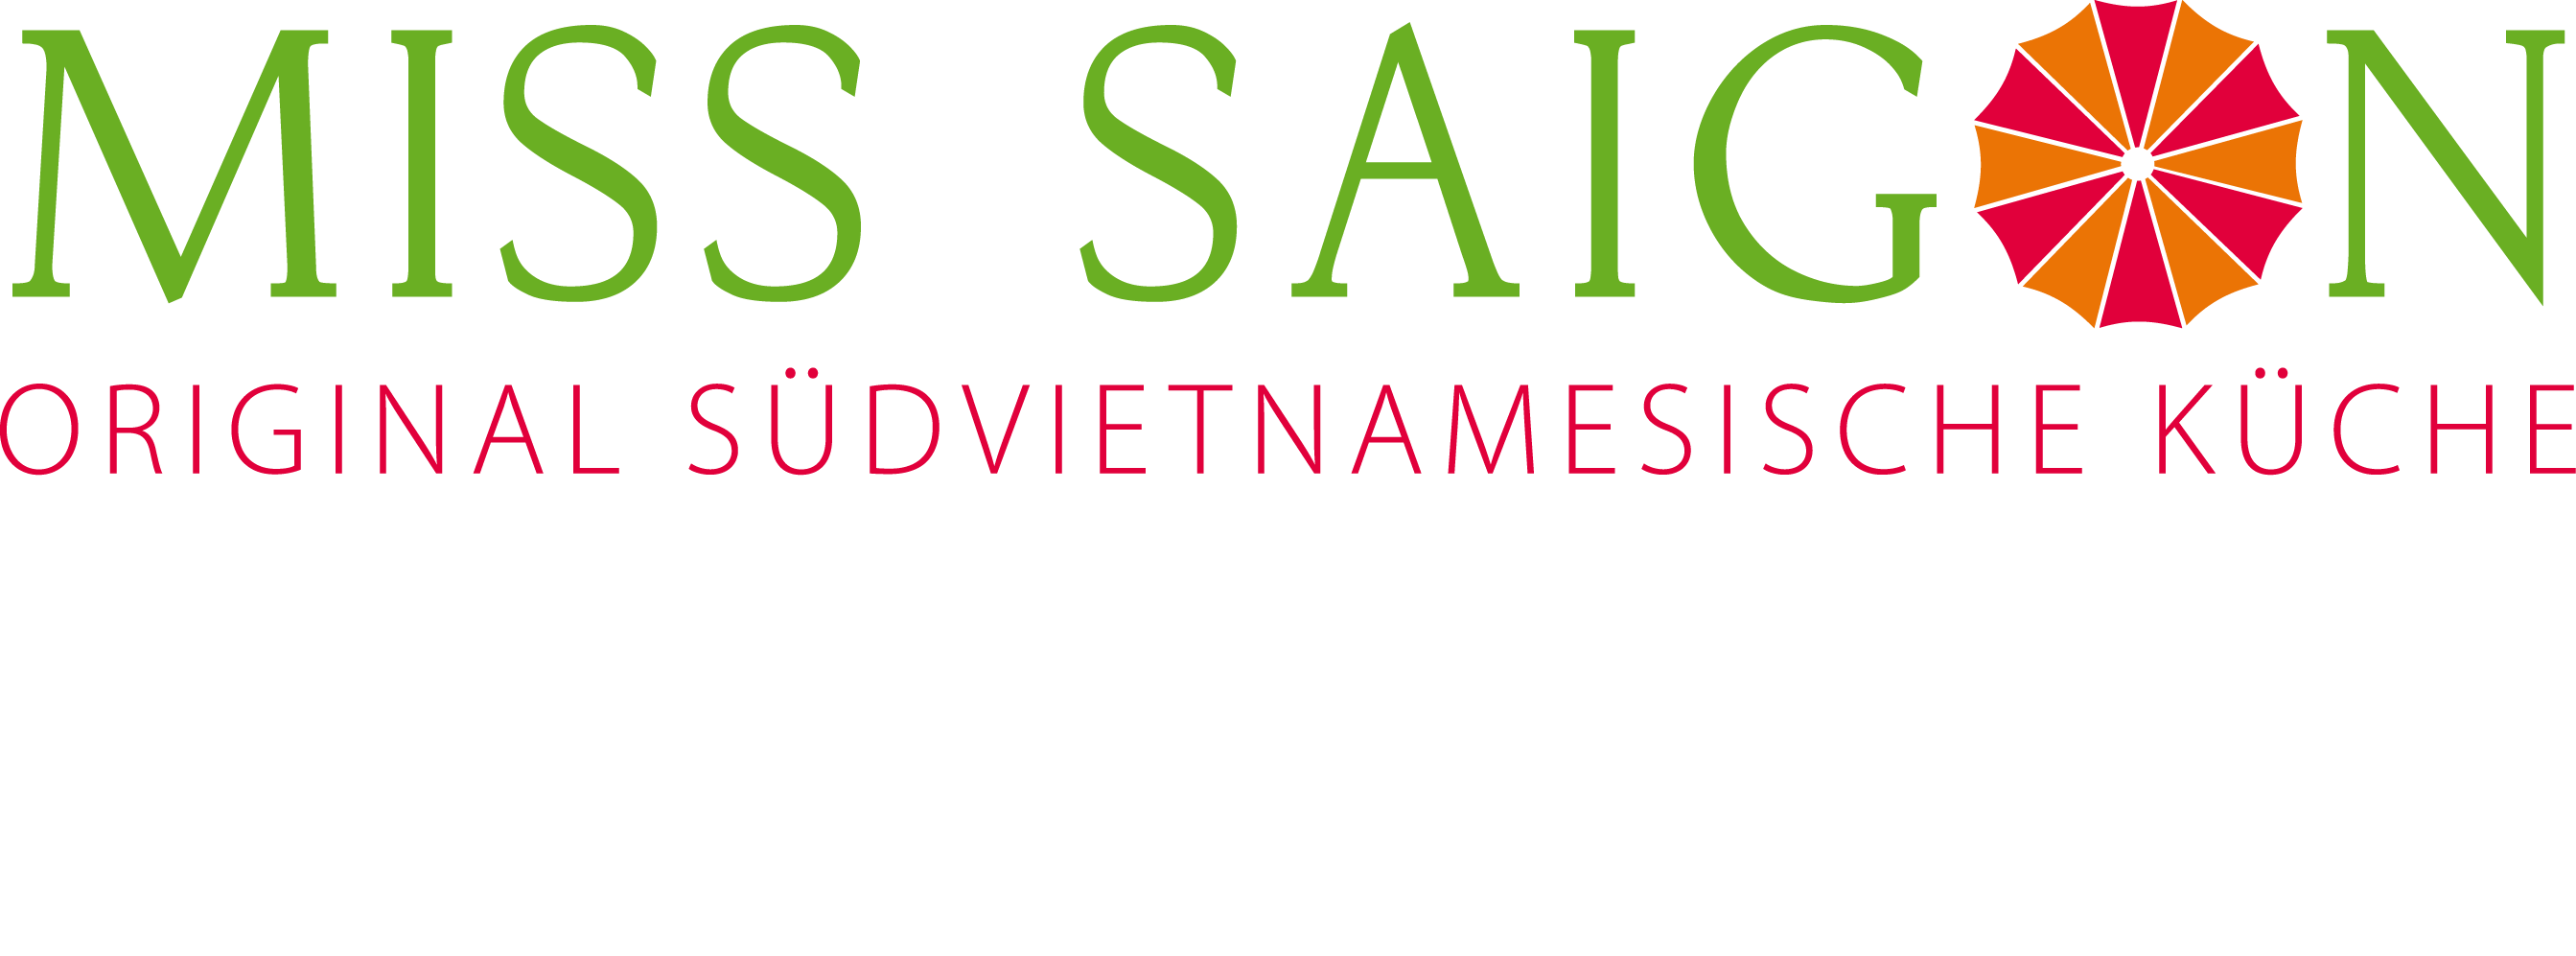 Logo Restaurant Miss Saigon Kreuzberg - Friedrichshain Berlin